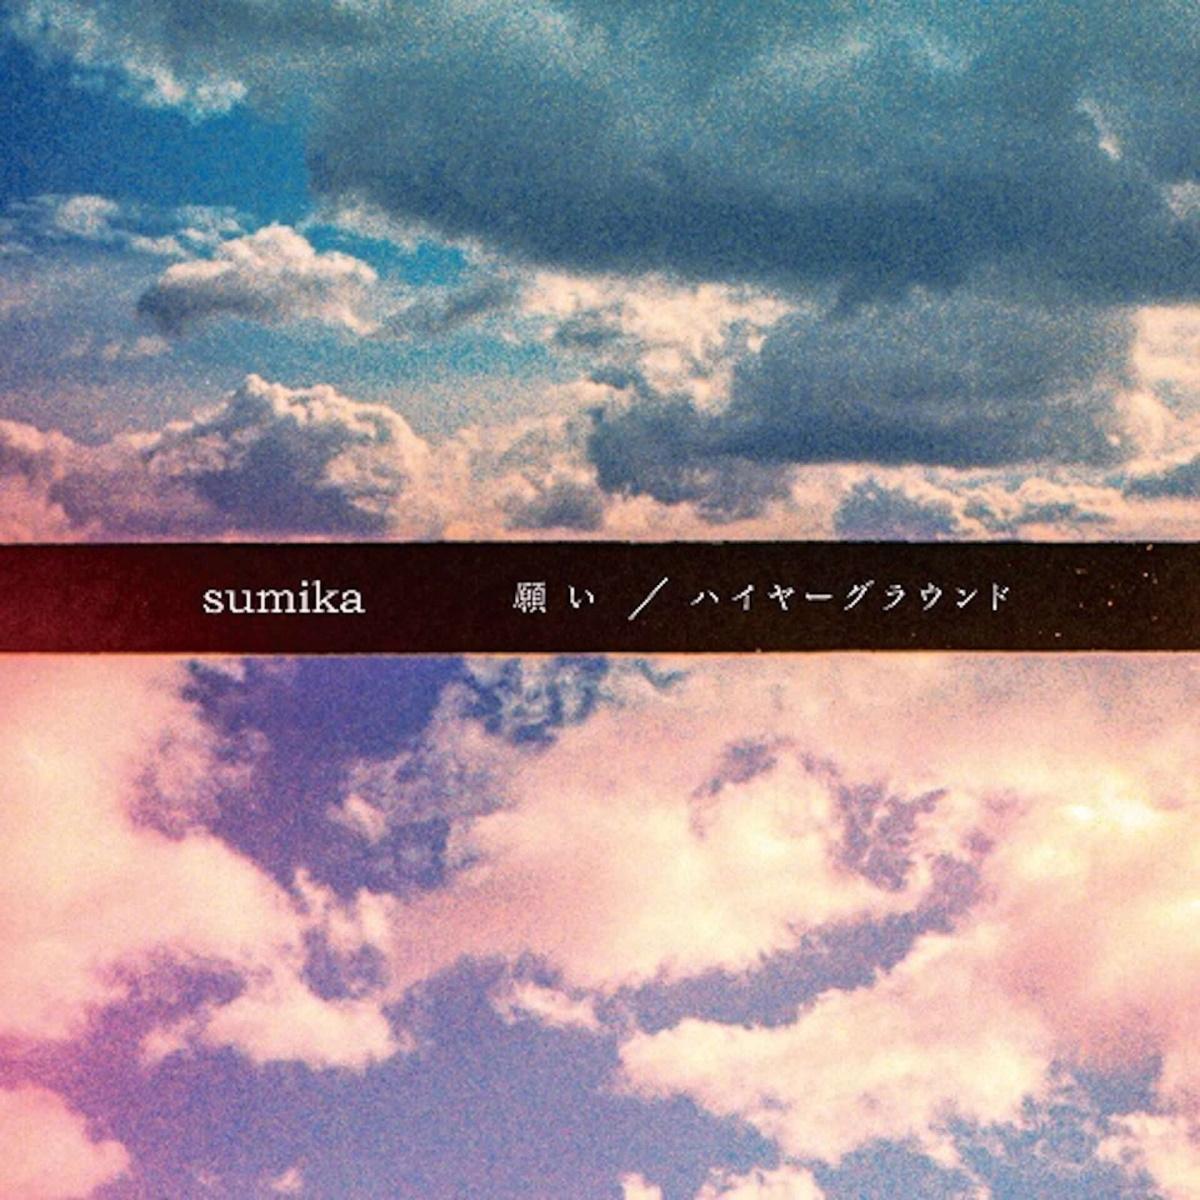 『sumika - ハイヤーグラウンド』収録の『願い/ハイヤーグラウンド』ジャケット